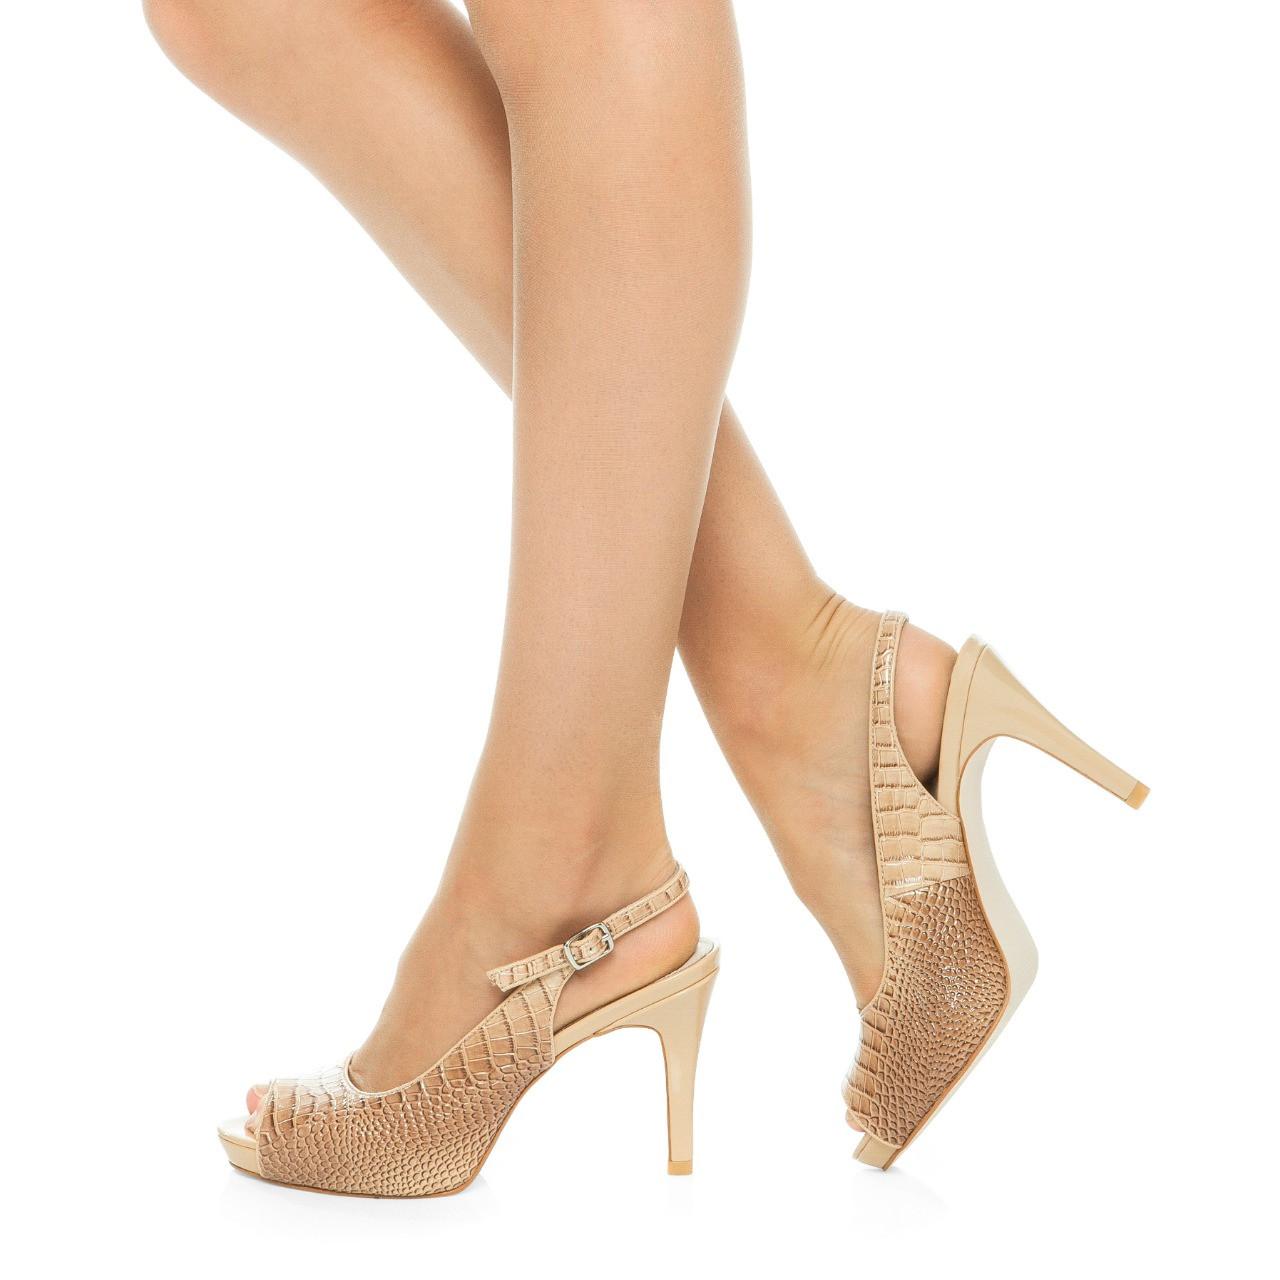 Nude Mid Heel Slingback I Bella by Scarlettos